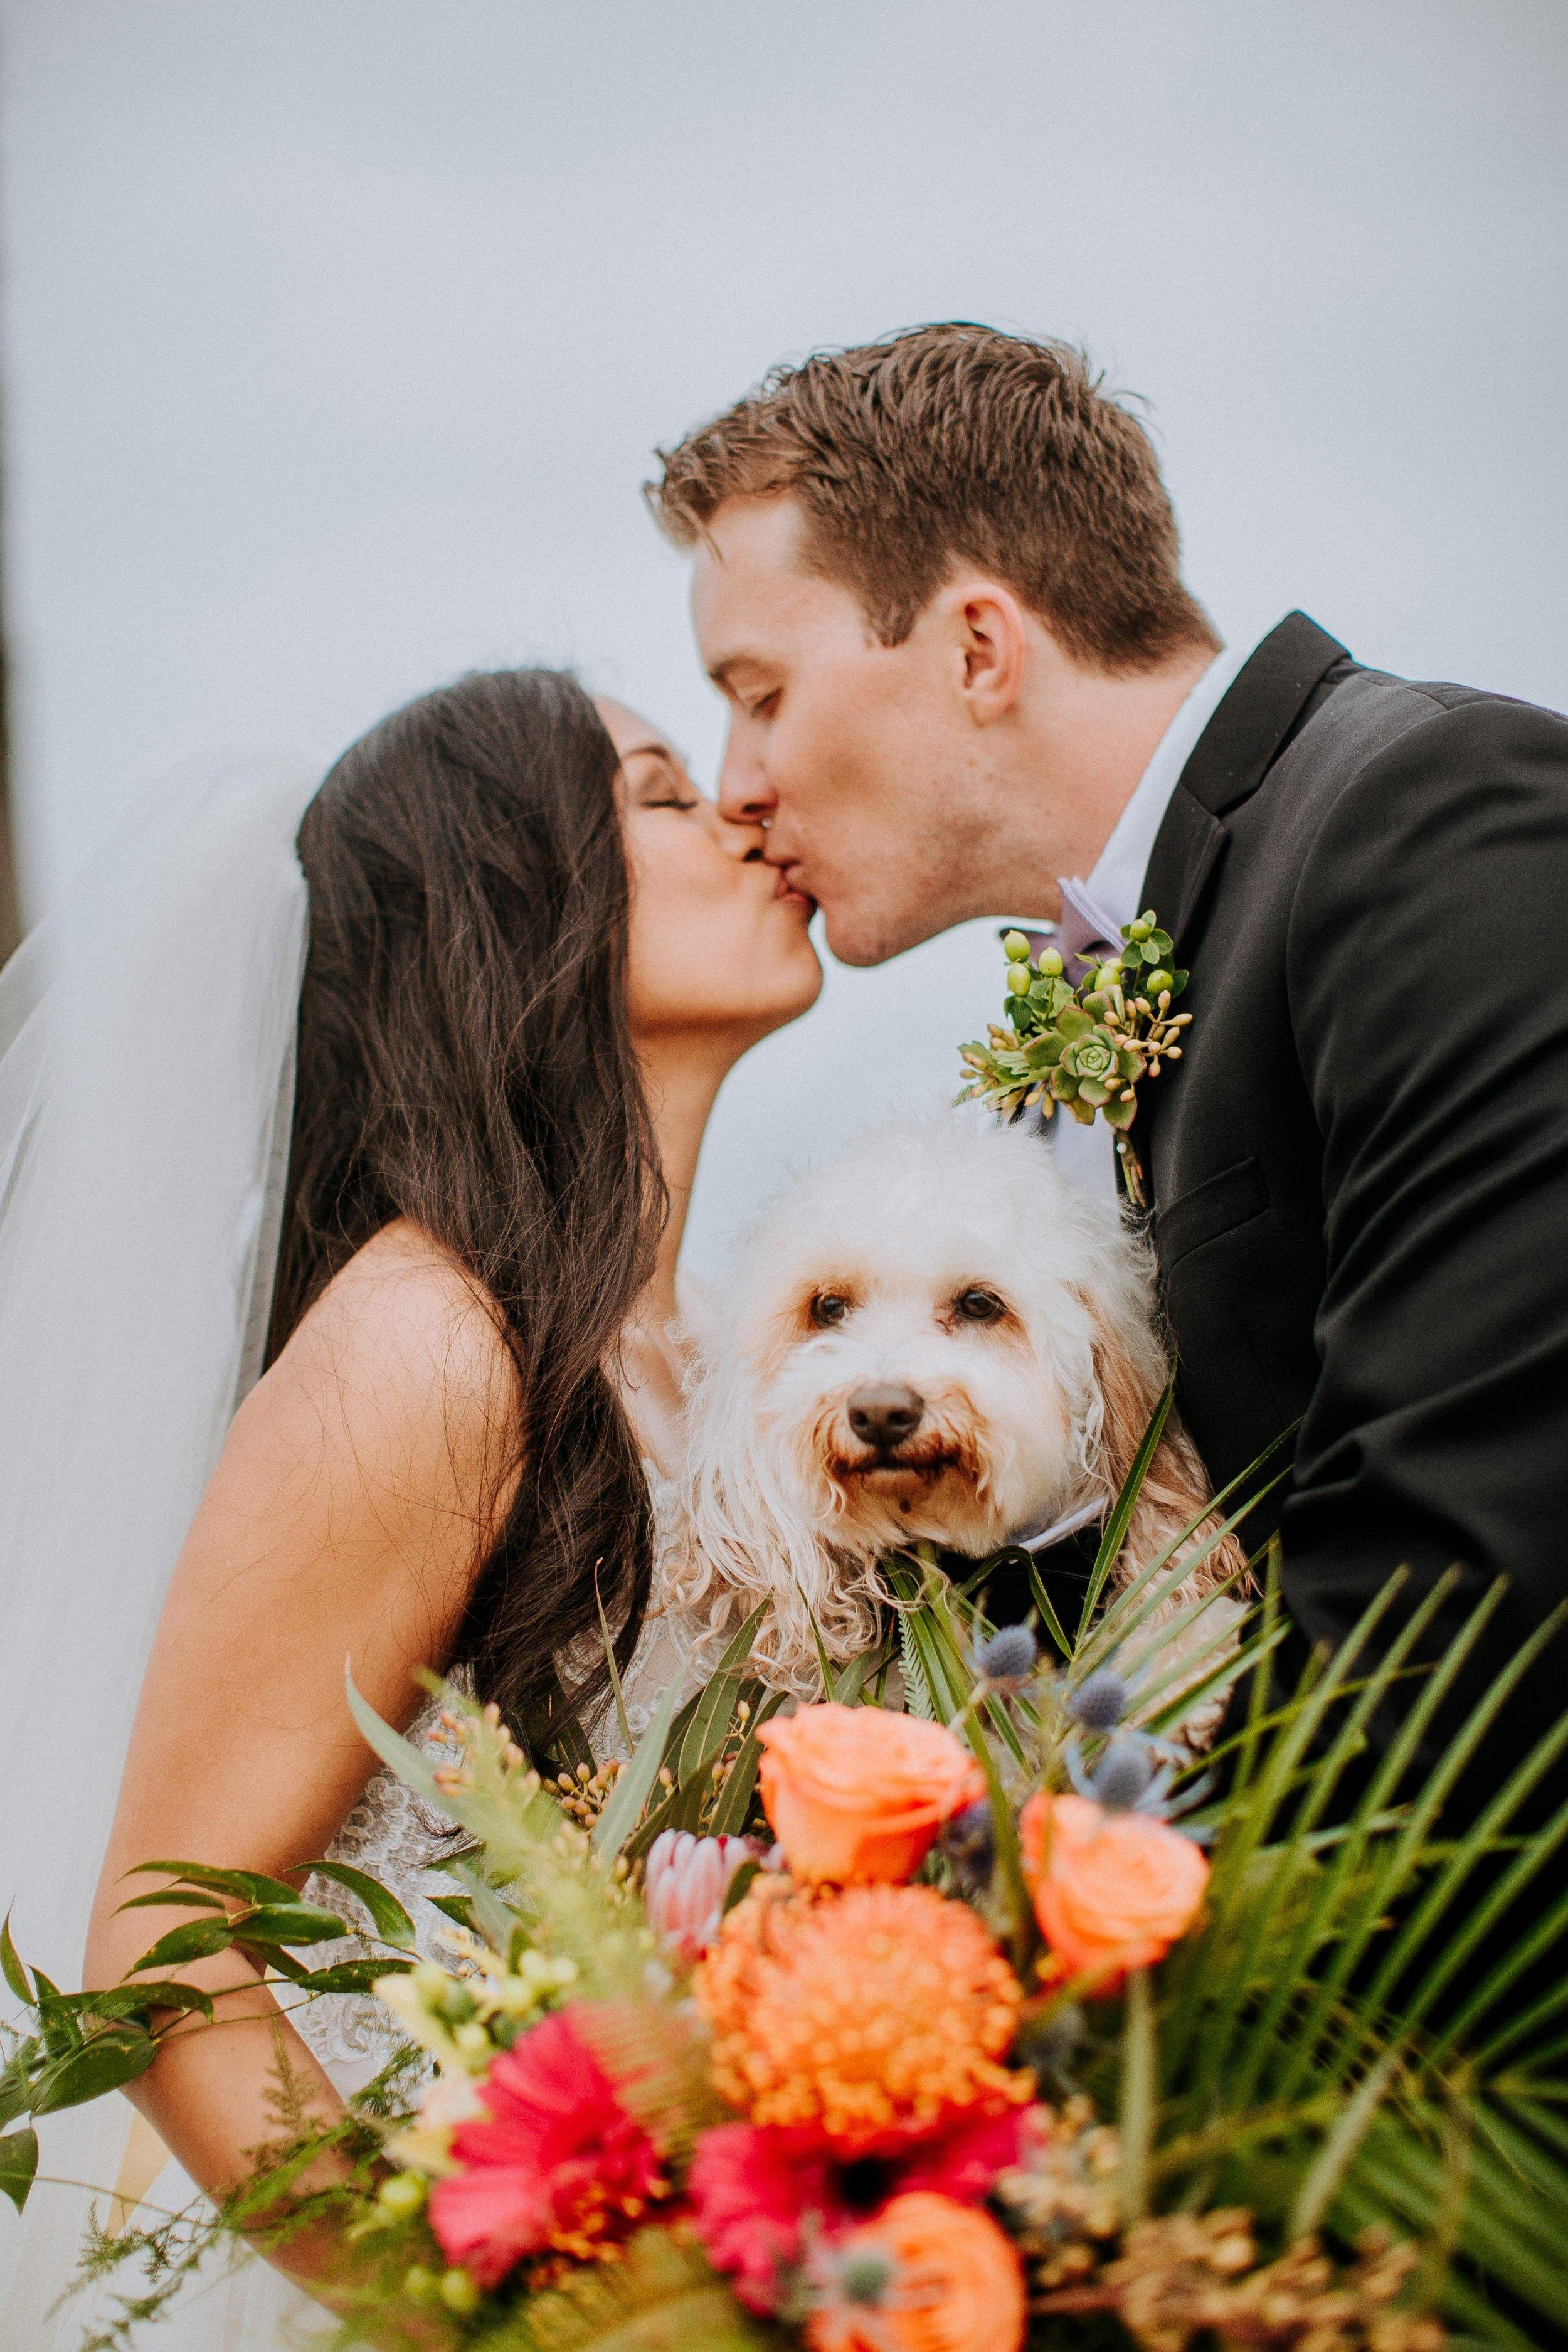 www.santabarbarawedding.com | Candice Marie Photography | Hilton Santa Barbara Beachfront Resort | Dalina Klan | Once in a Lifetime Weddings | Alpha Floral | Bride and Groom Share a Kiss